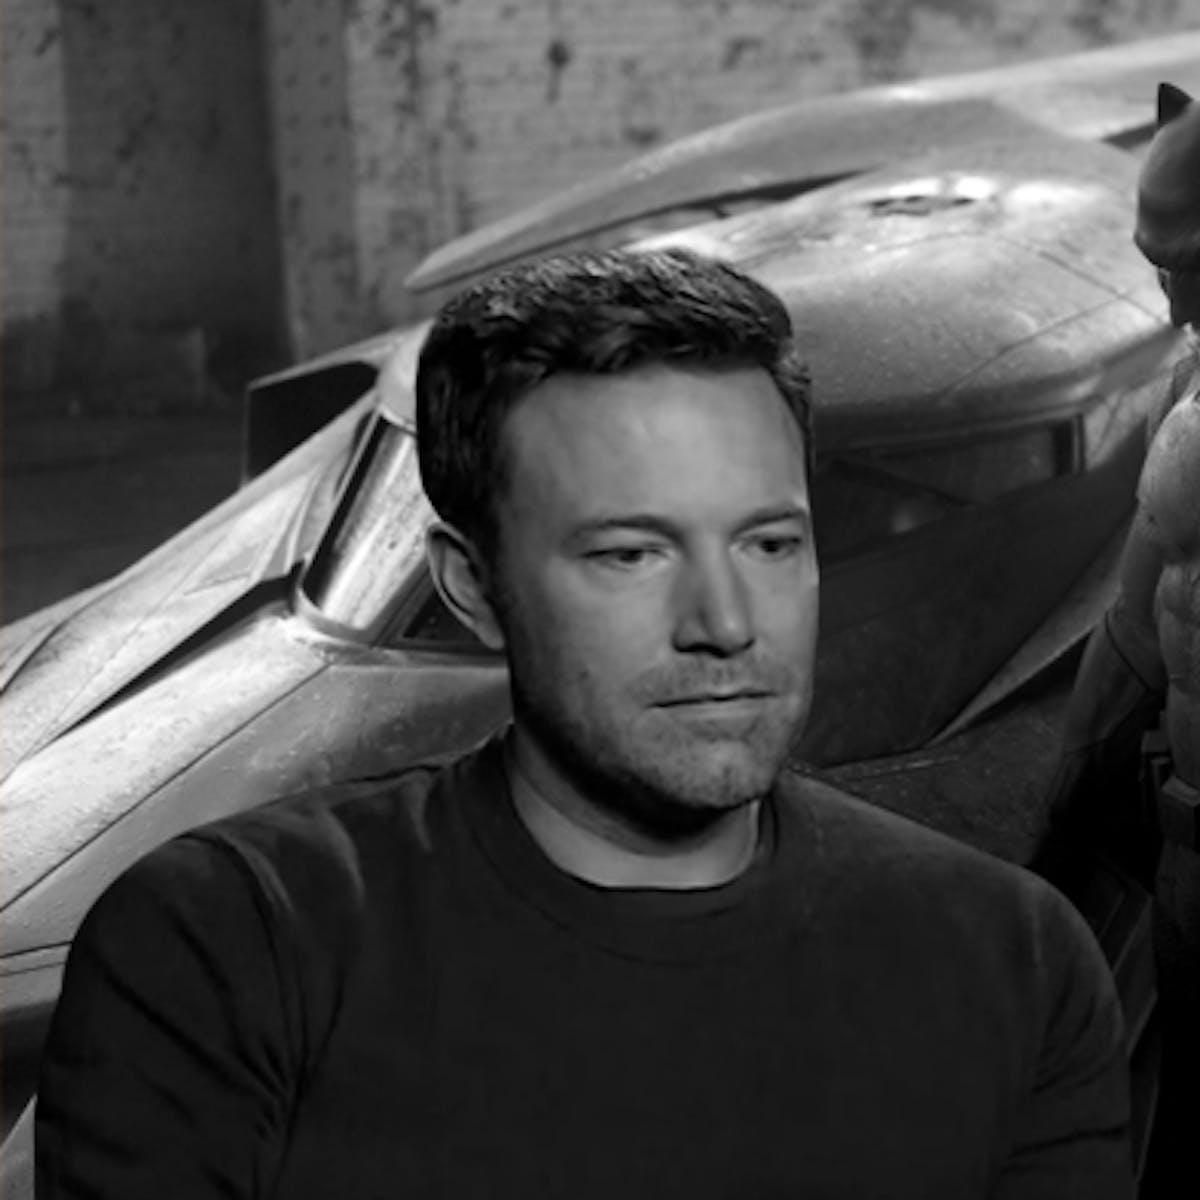 Tom King Says 'I Am Suicide' Self-Harming Fits Batman's